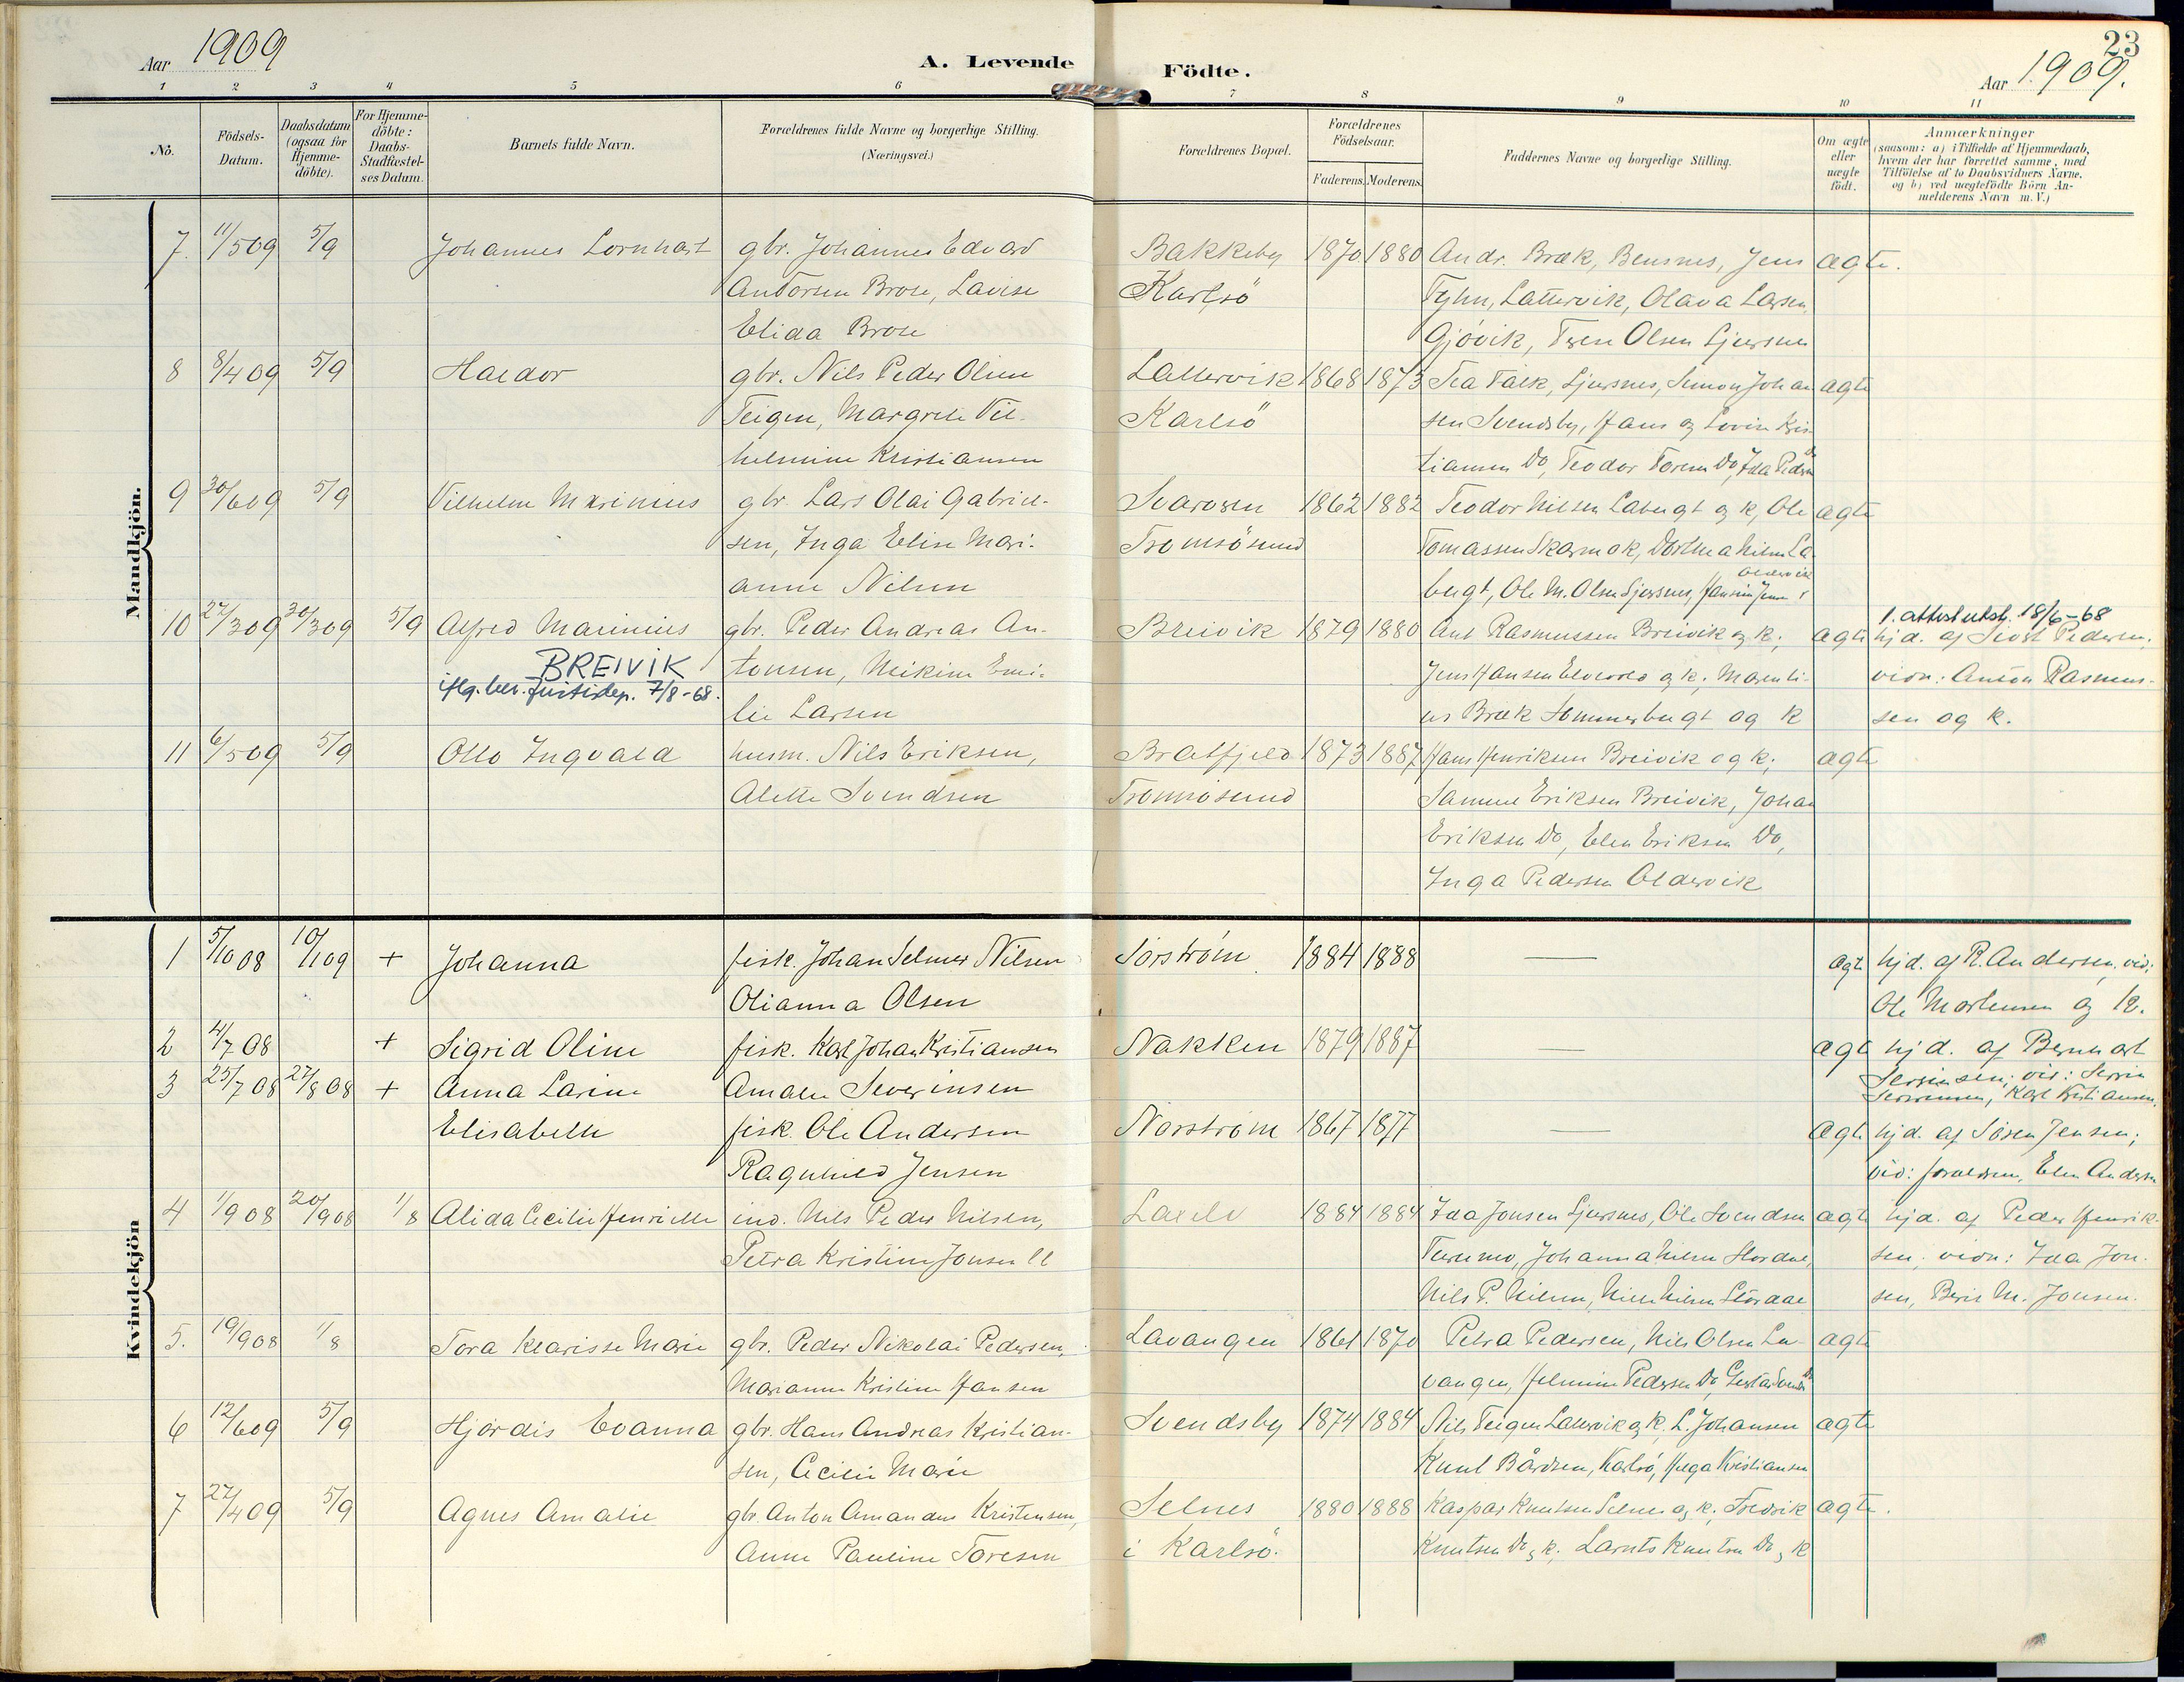 SATØ, Lyngen sokneprestembete, Ministerialbok nr. 14, 1905-1920, s. 23